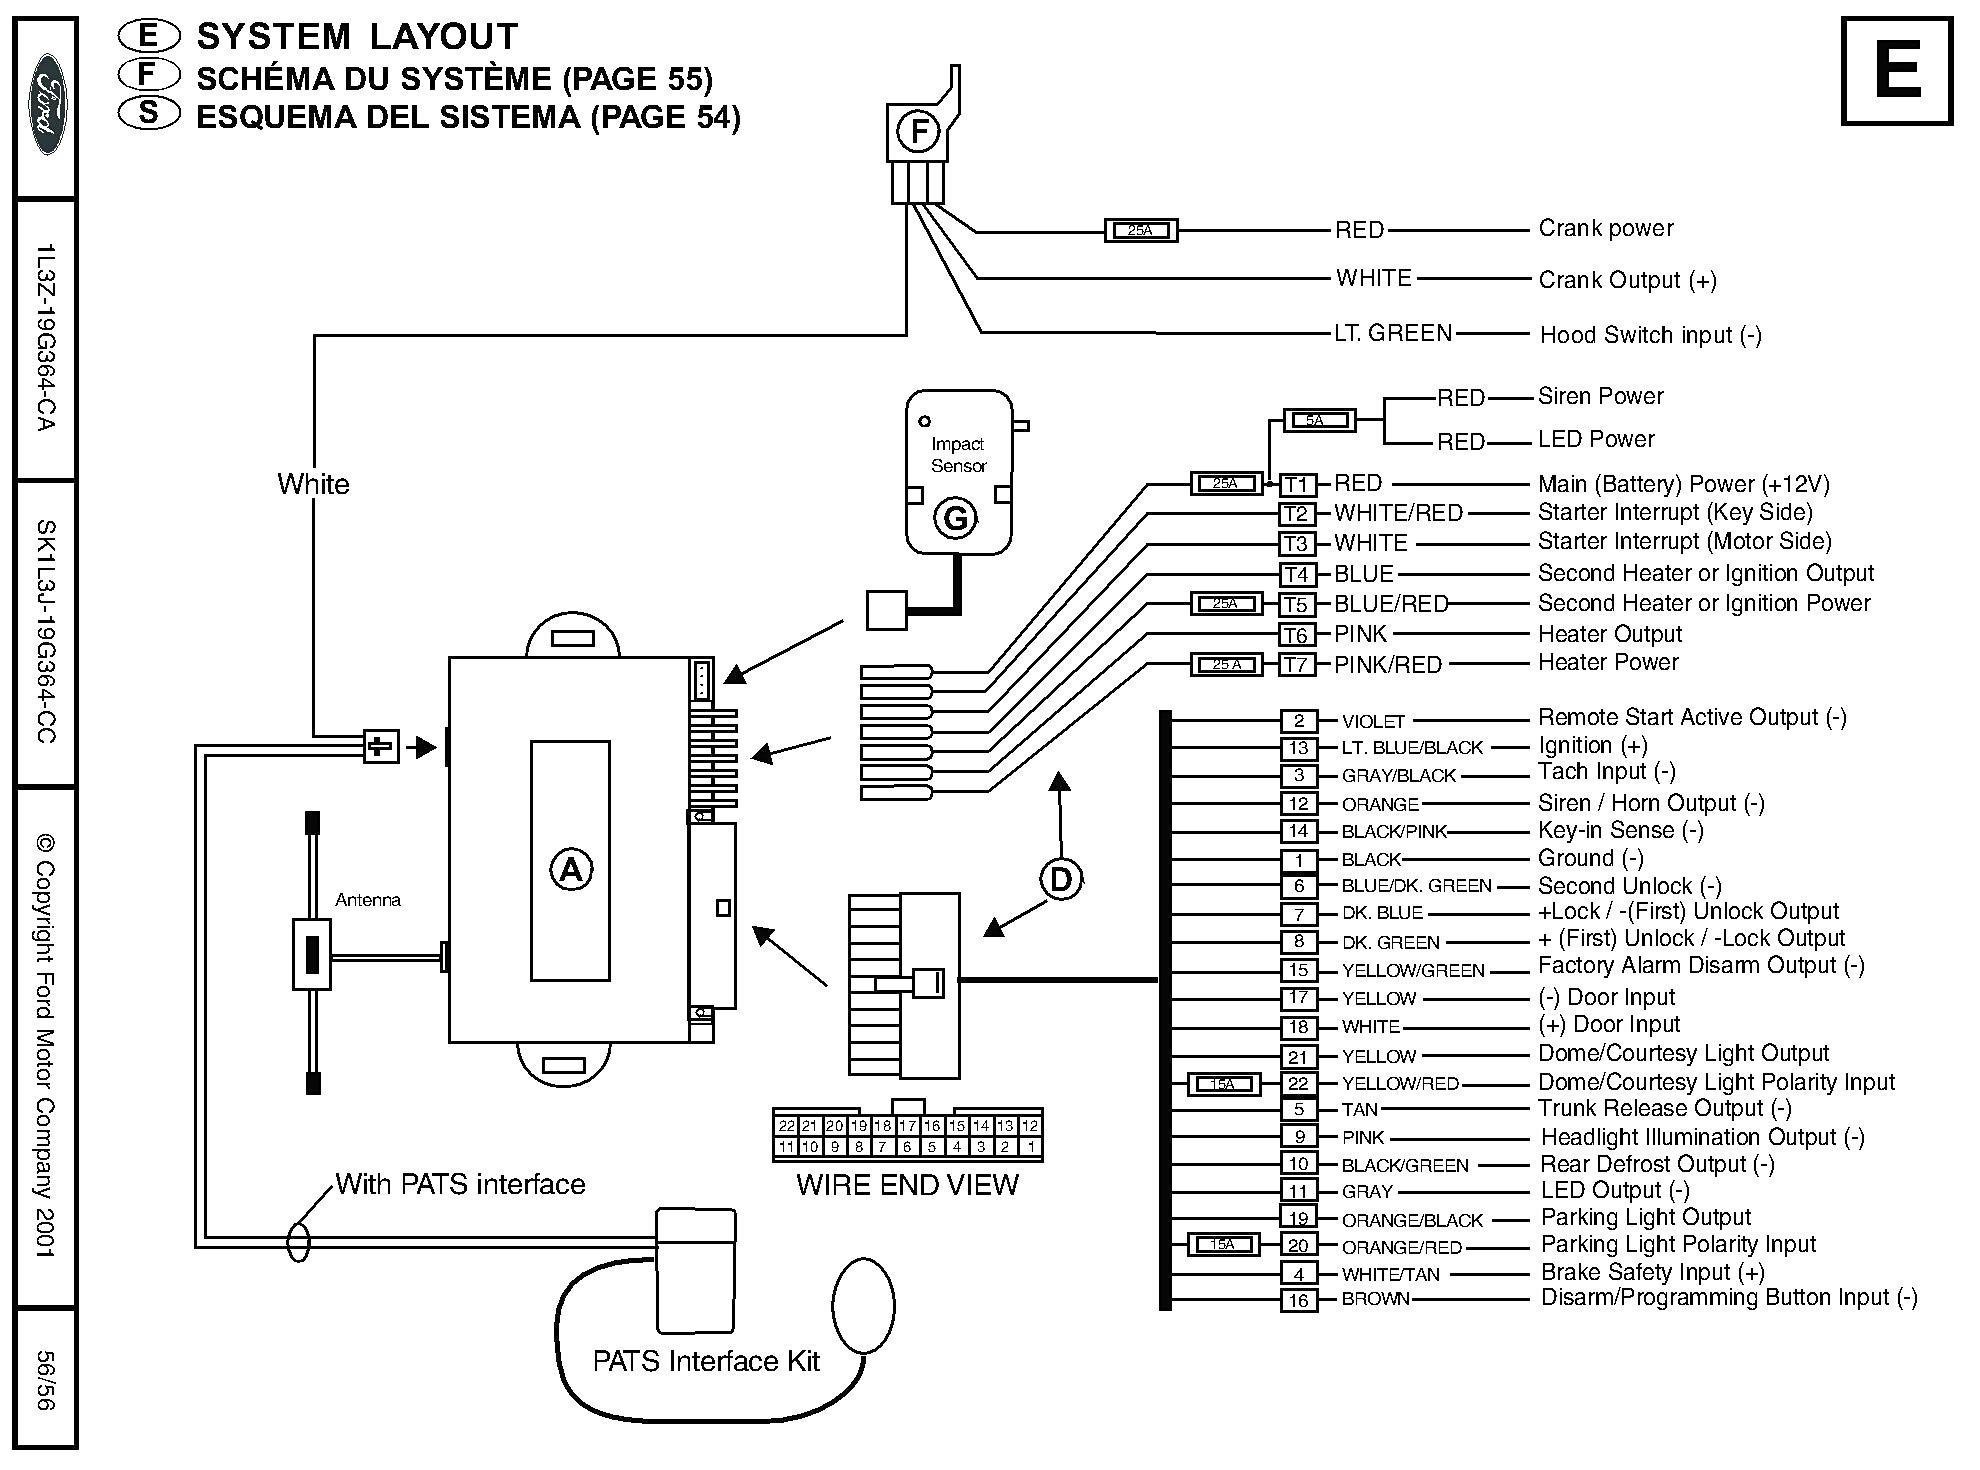 Viper 5706v Installation Guide Diagram Vy 1903] Wiring Diagram In Addition Viper Remote Start Of Viper 5706v Installation Guide Diagram